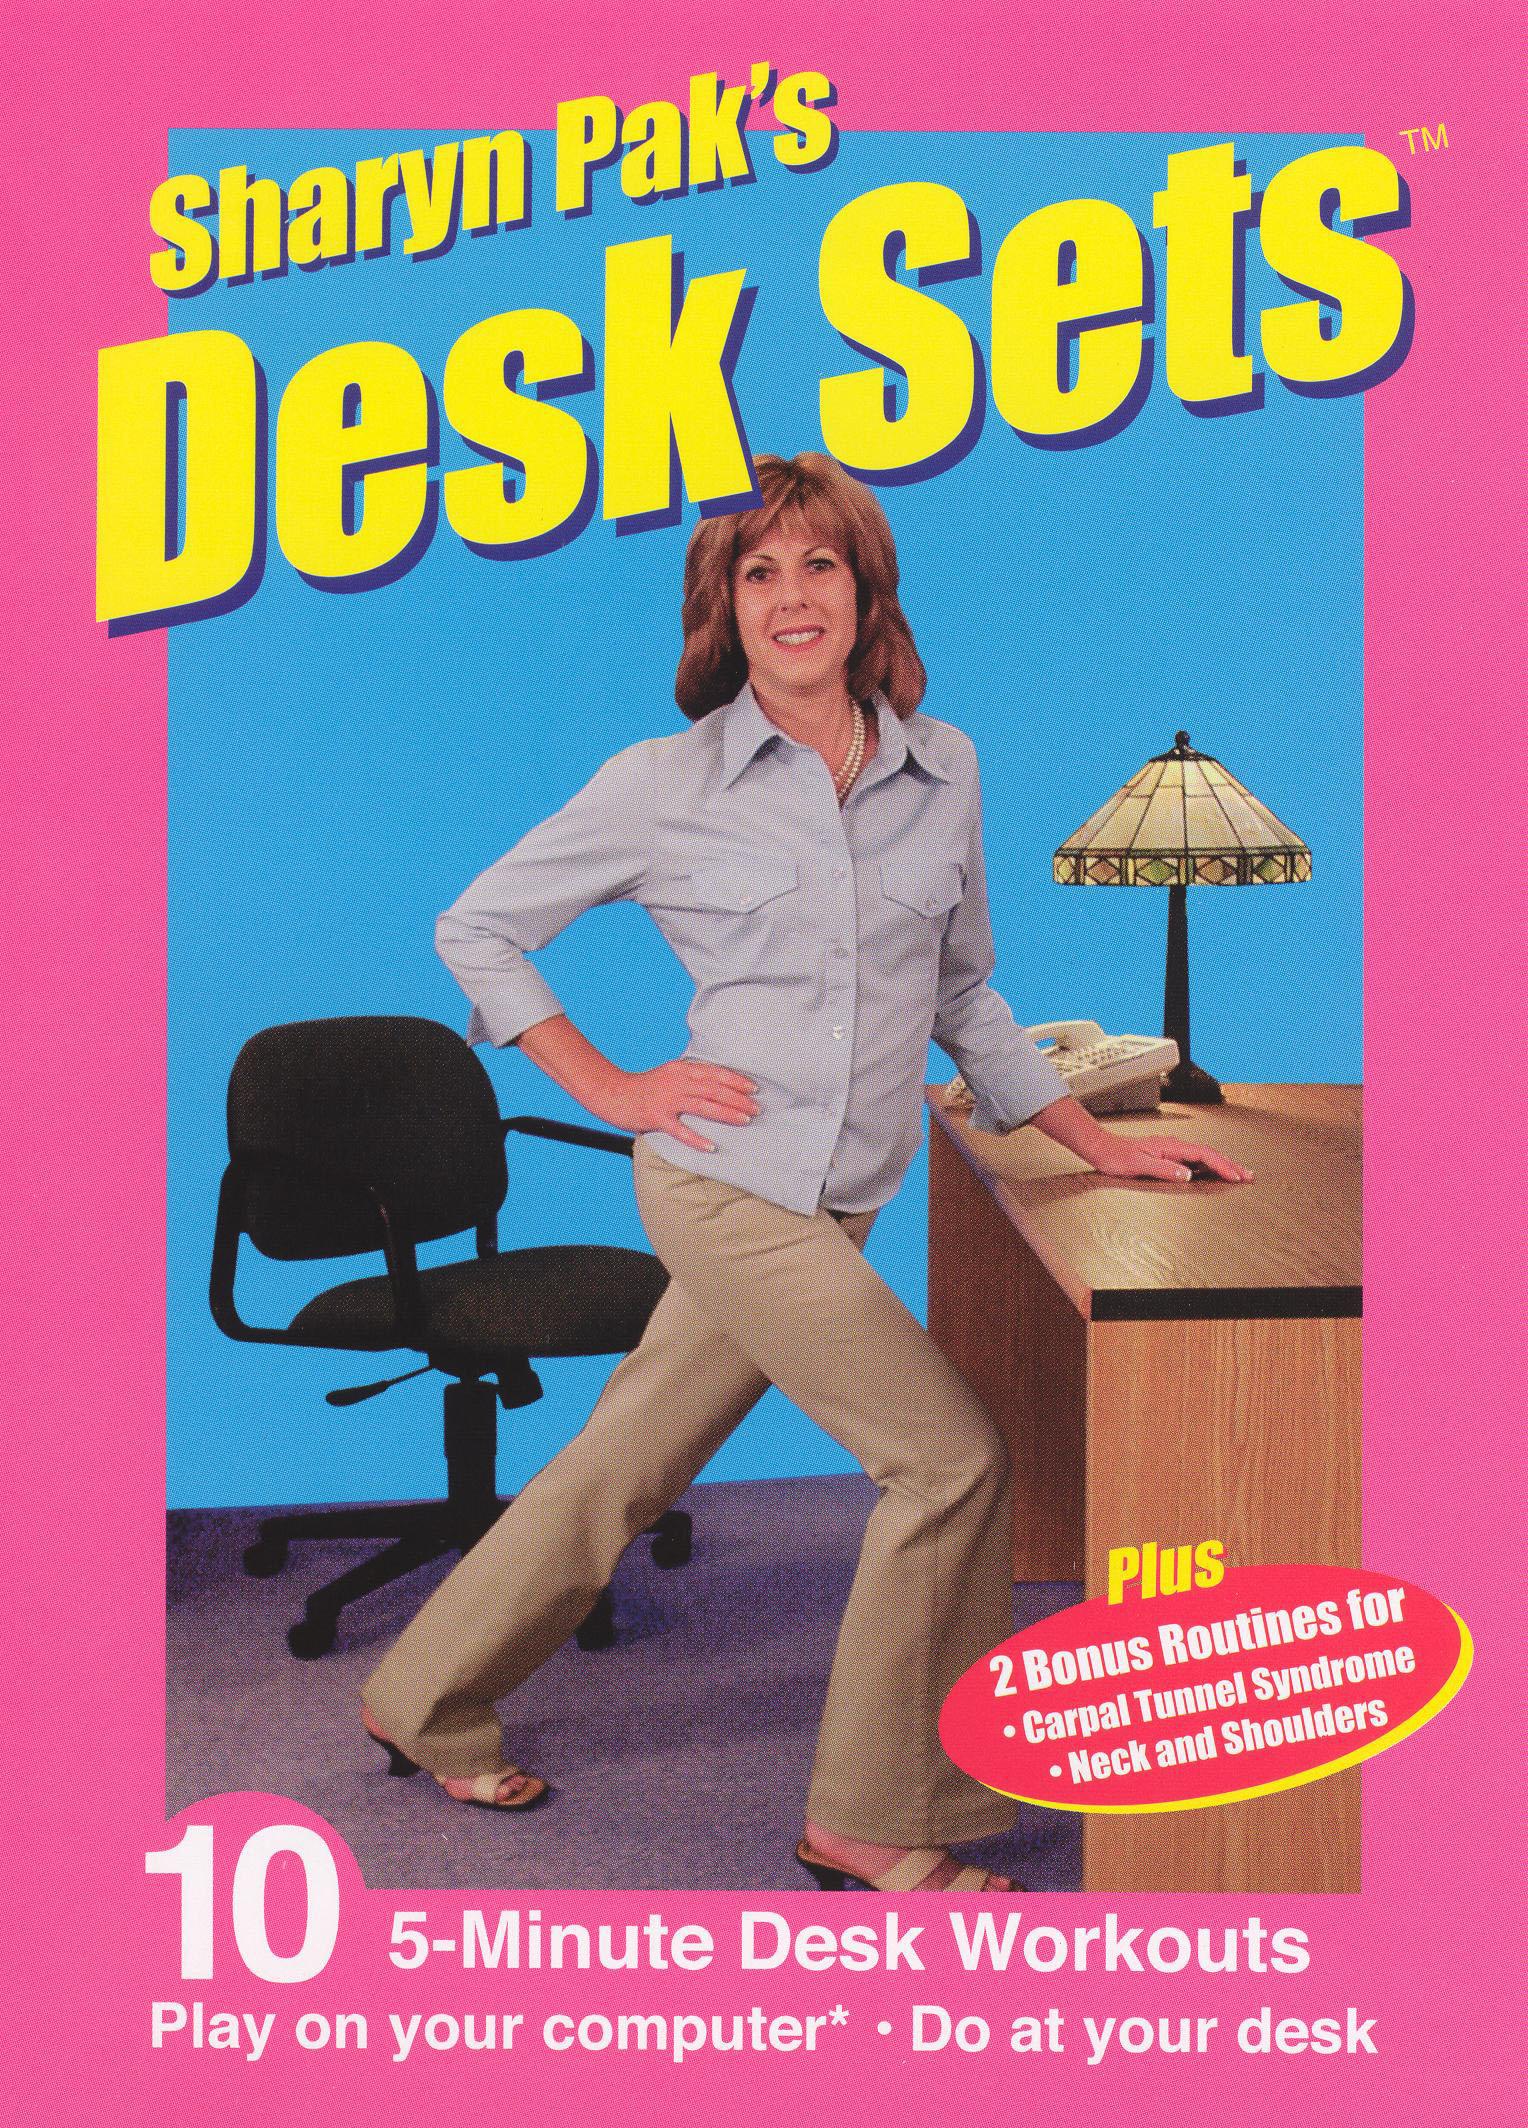 Sharyn Pak's Desk Sets